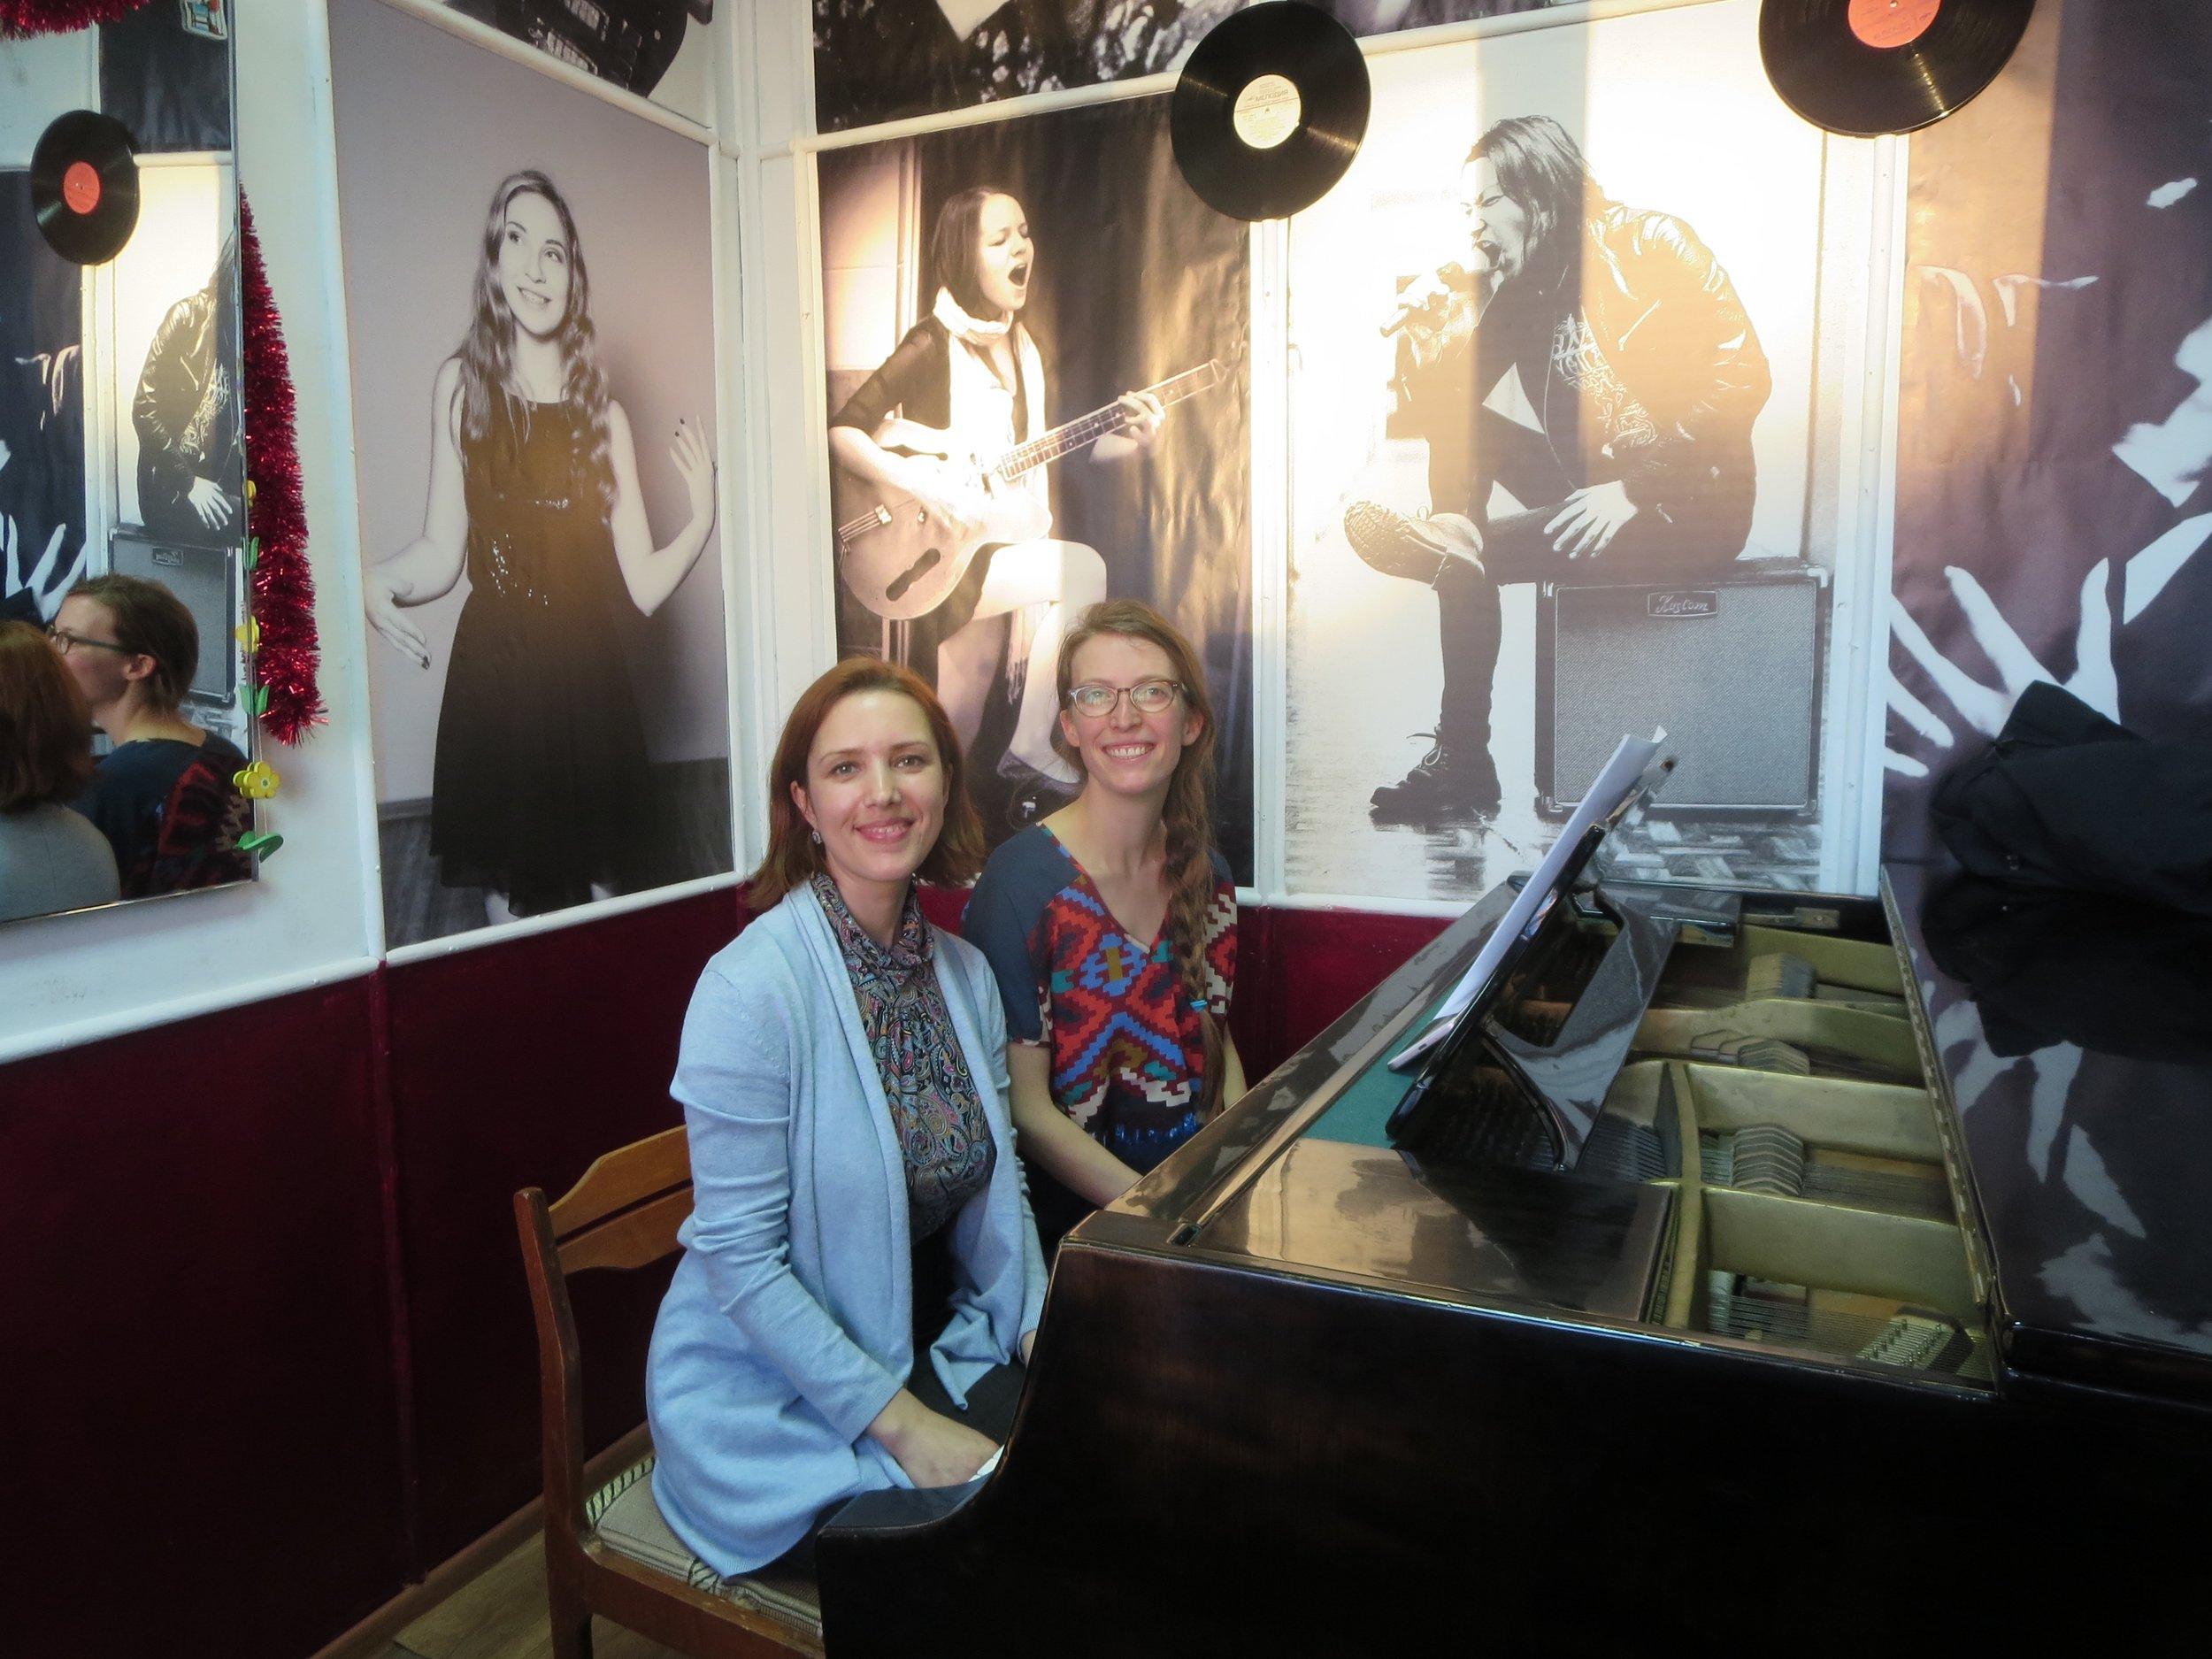 Oksana and I together in Anna Akimova's teaching studio in Arkhangelsk.